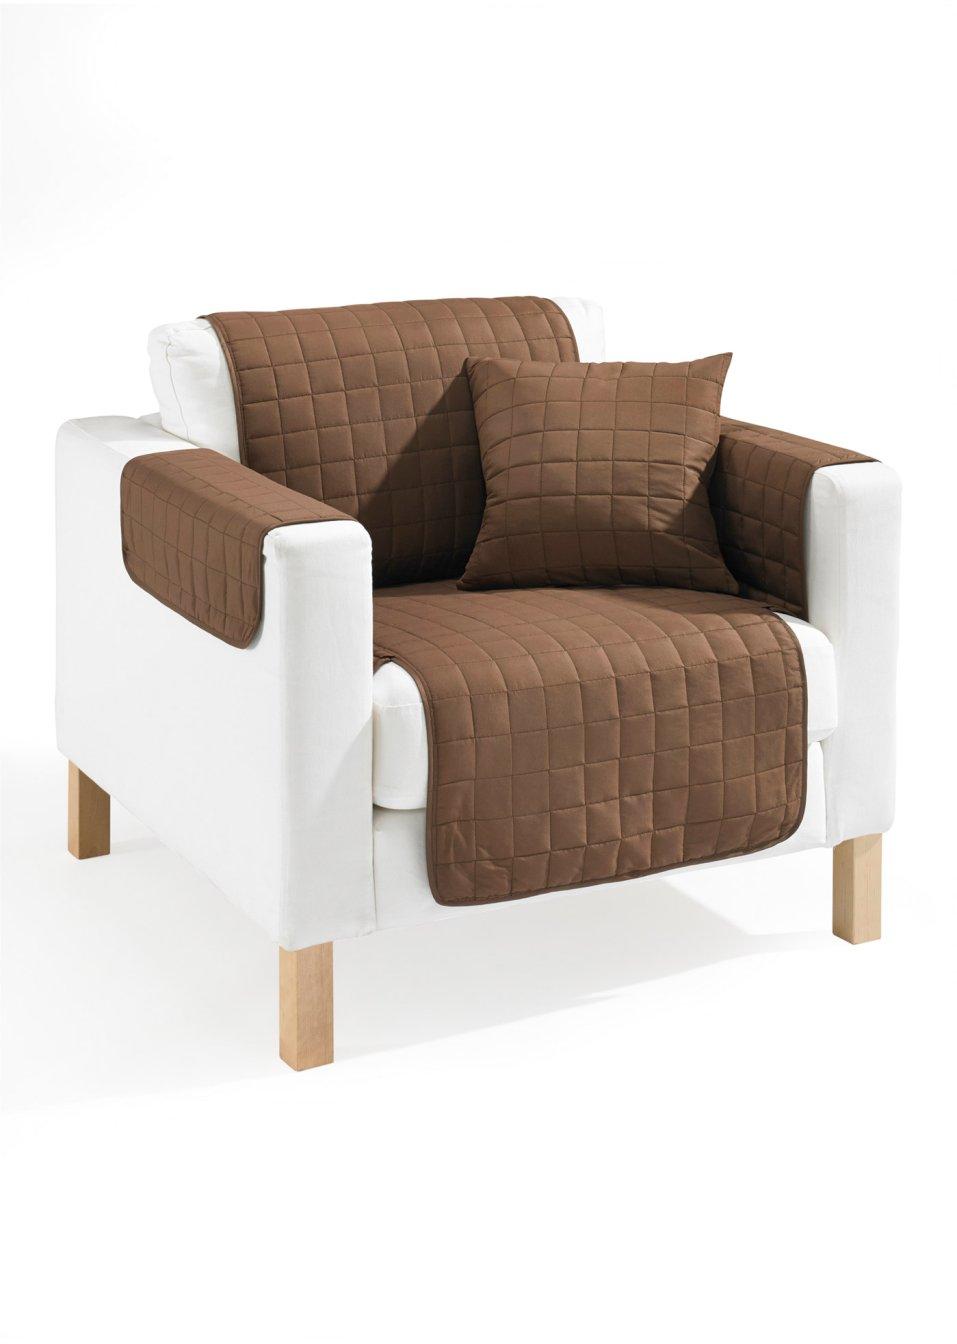 jete de canape d angle hoze home. Black Bedroom Furniture Sets. Home Design Ideas